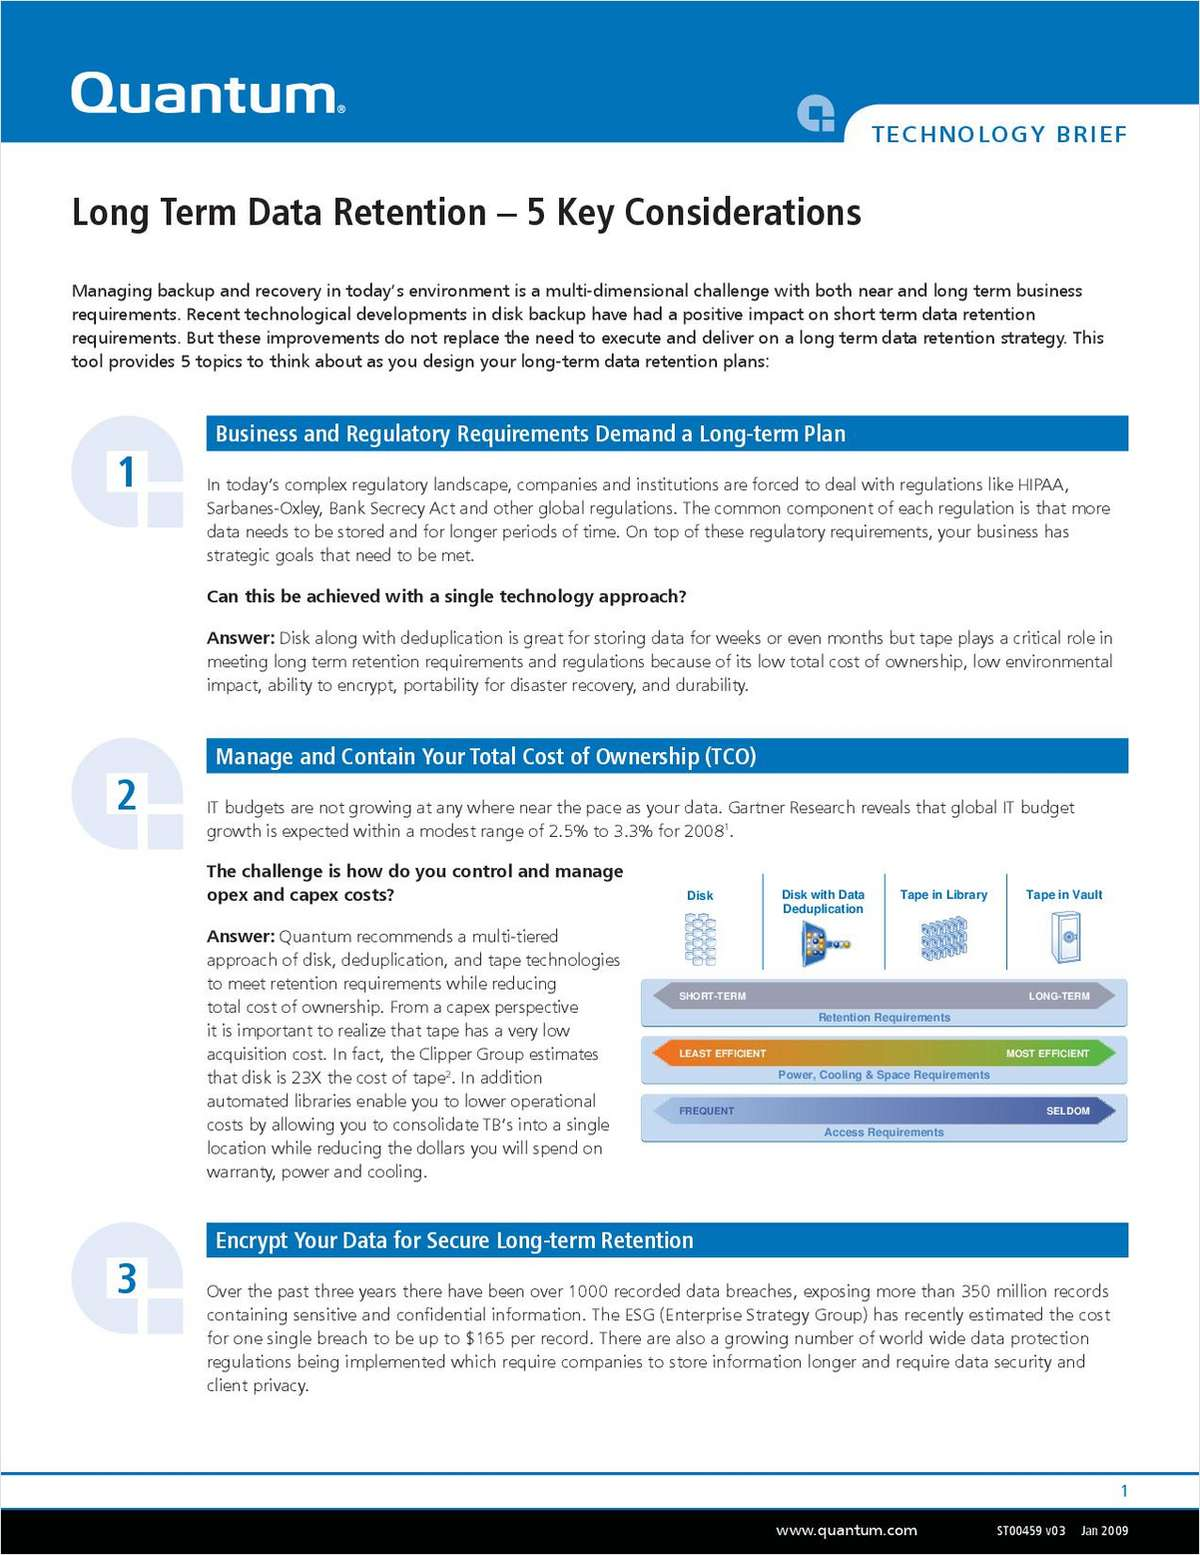 Long Term Data Retention: 5 Key Considerations